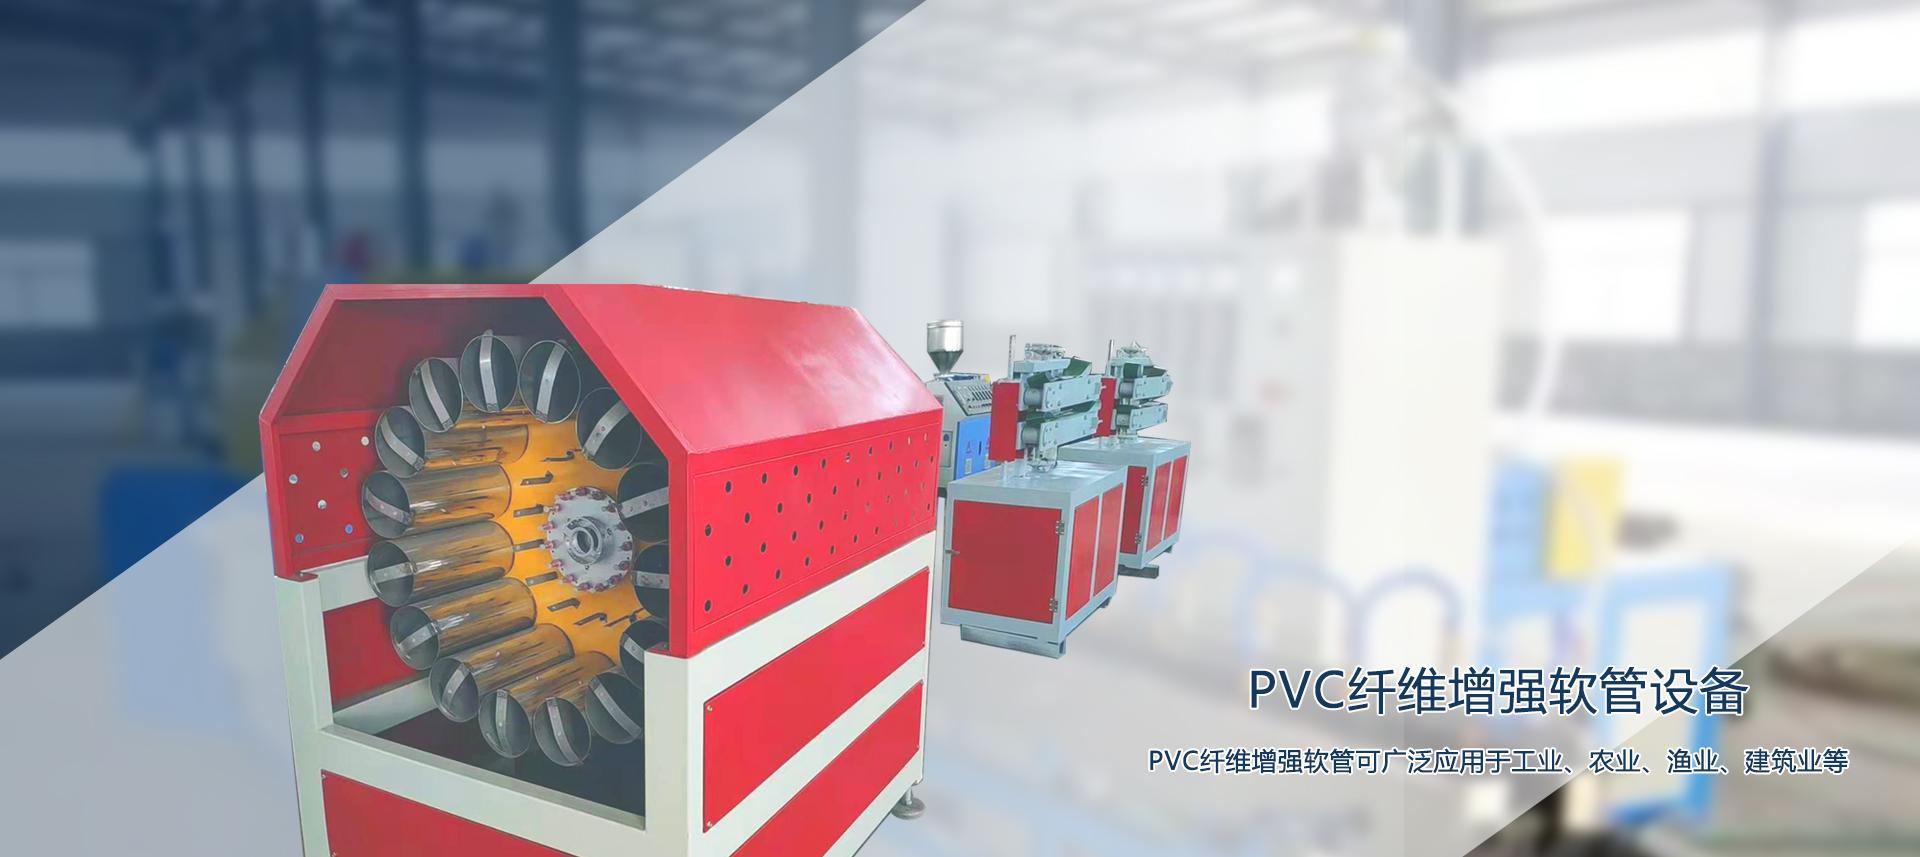 pvc軟管設備